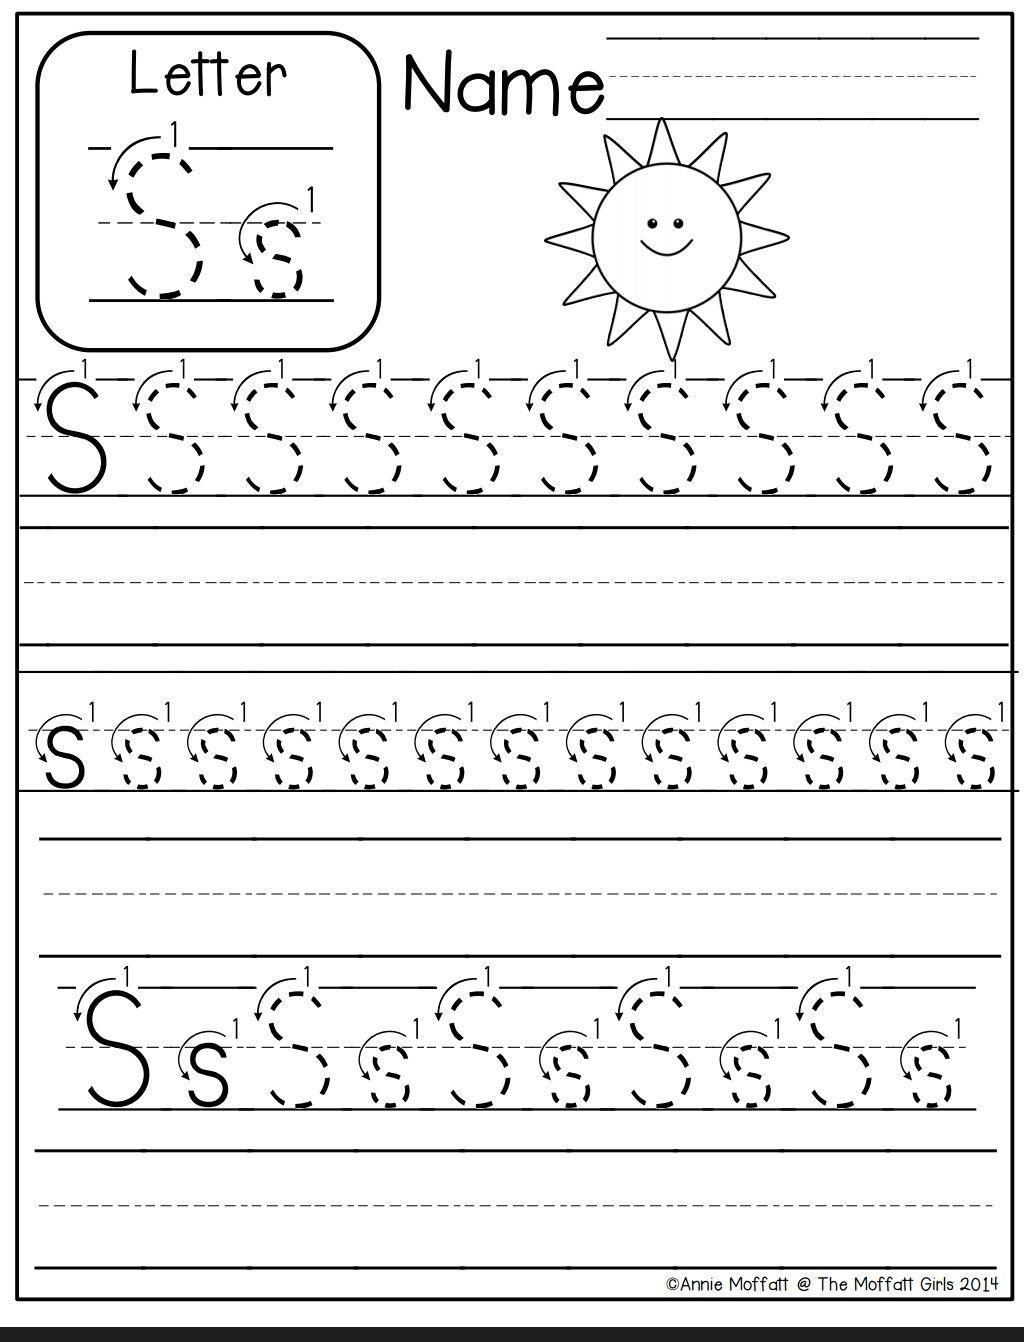 Letter S Worksheet Alphabet Worksheets Preschool Writing Worksheets Kindergarten Kindergarten Worksheets Printable